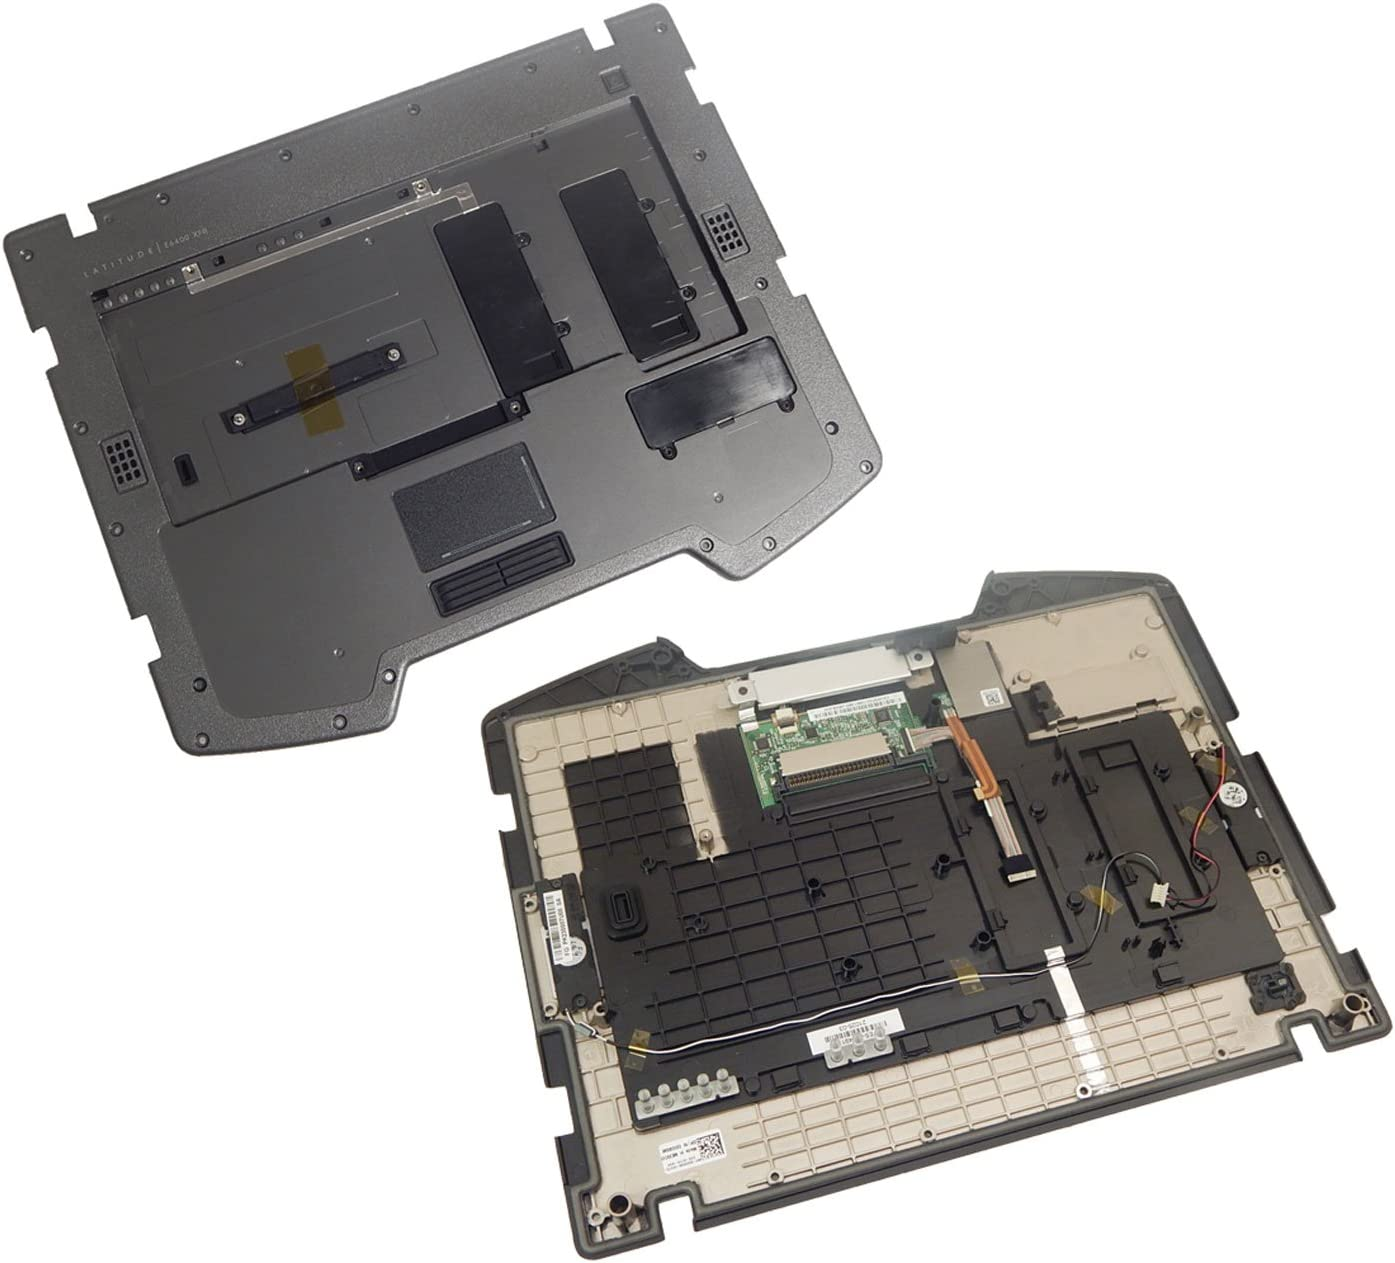 Dell E6400 XFR Rugged Palmrest Touchpad D095M 21025-04 FM742-TP